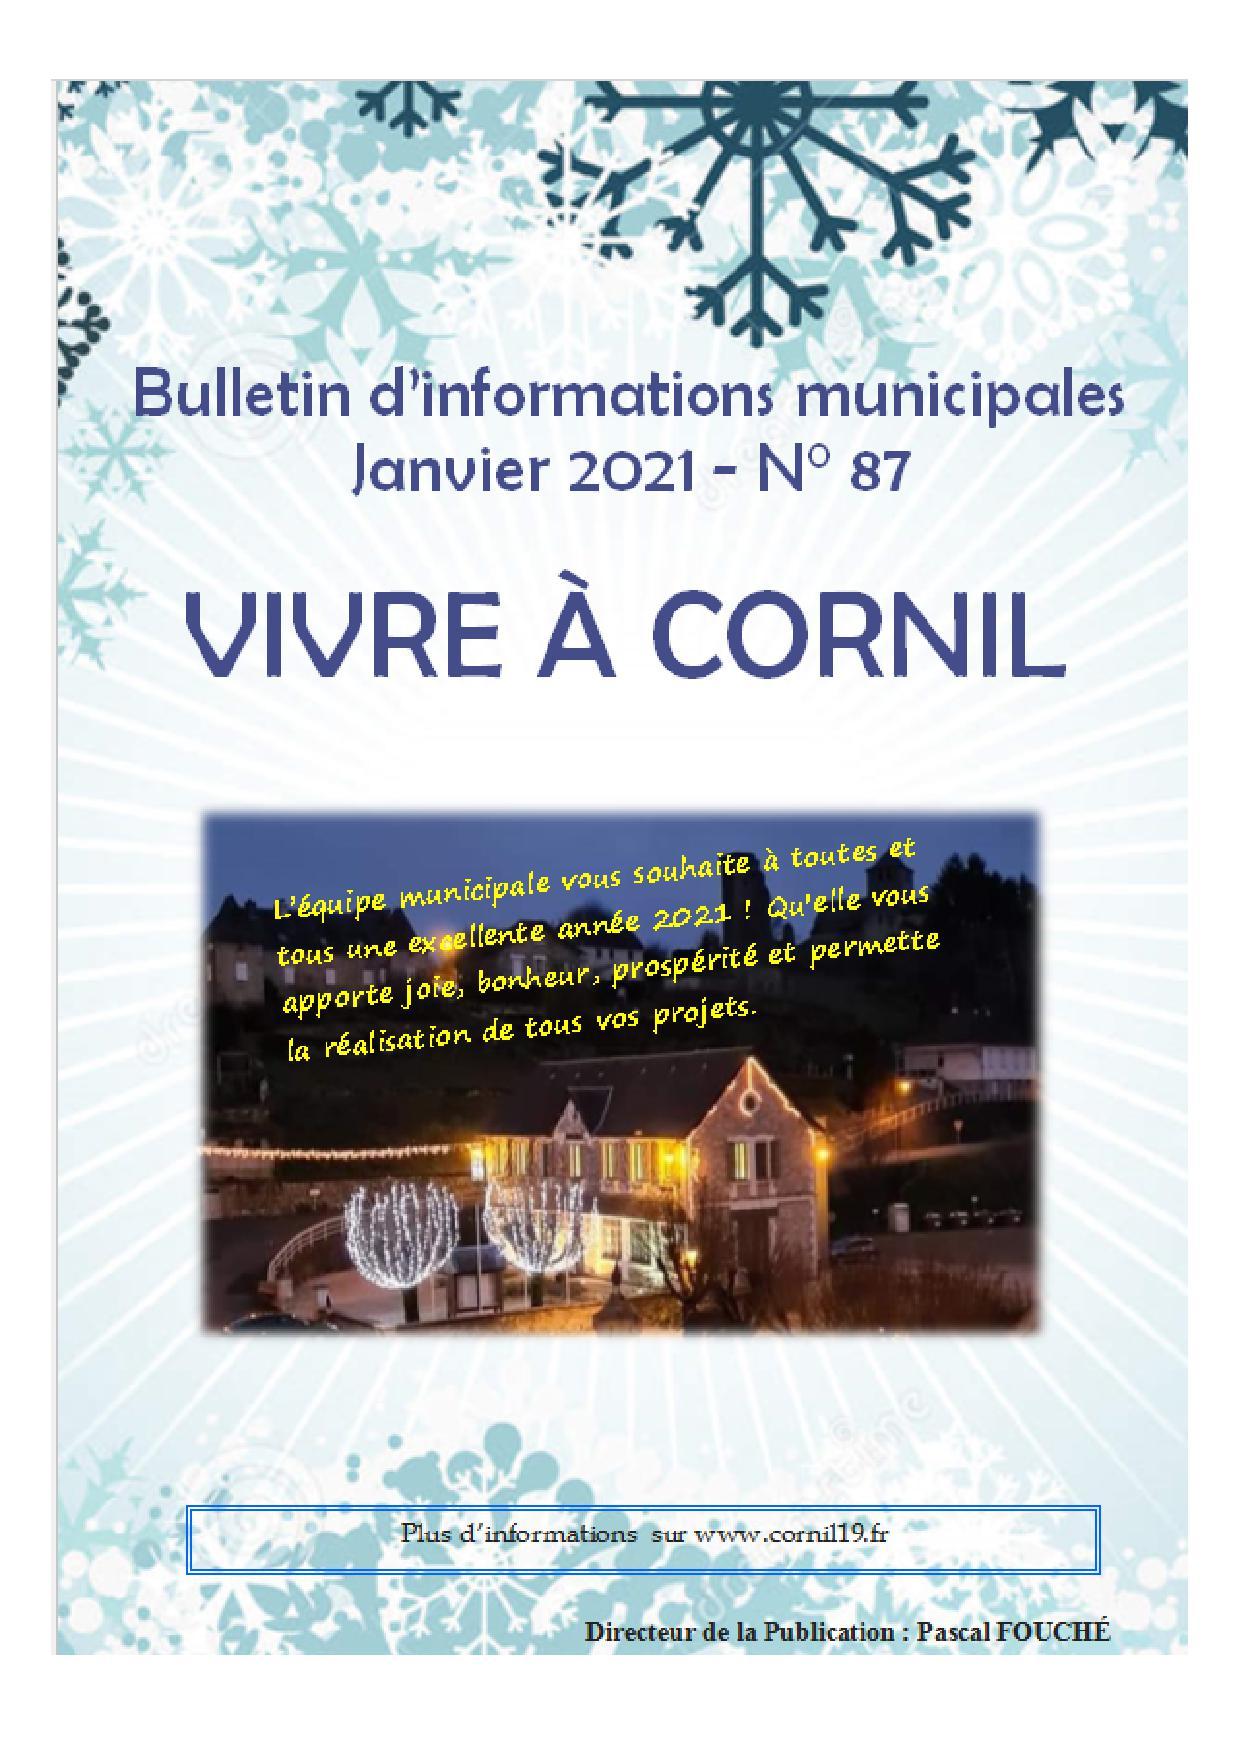 Vivre à Cornil n°87 Janvier 2021.jpg